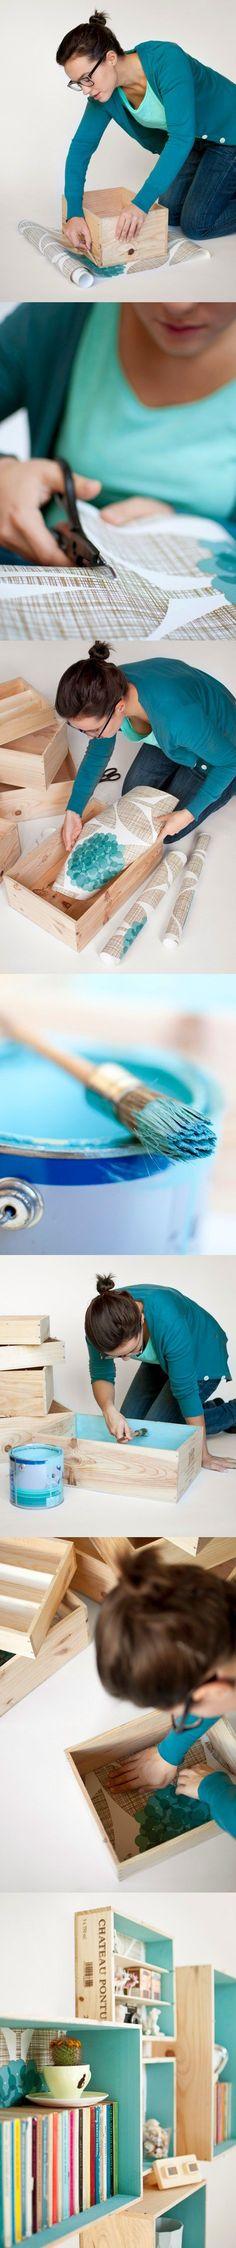 Estantería pintada y forrada - woonblog.be - DIY Floating Box Shelves